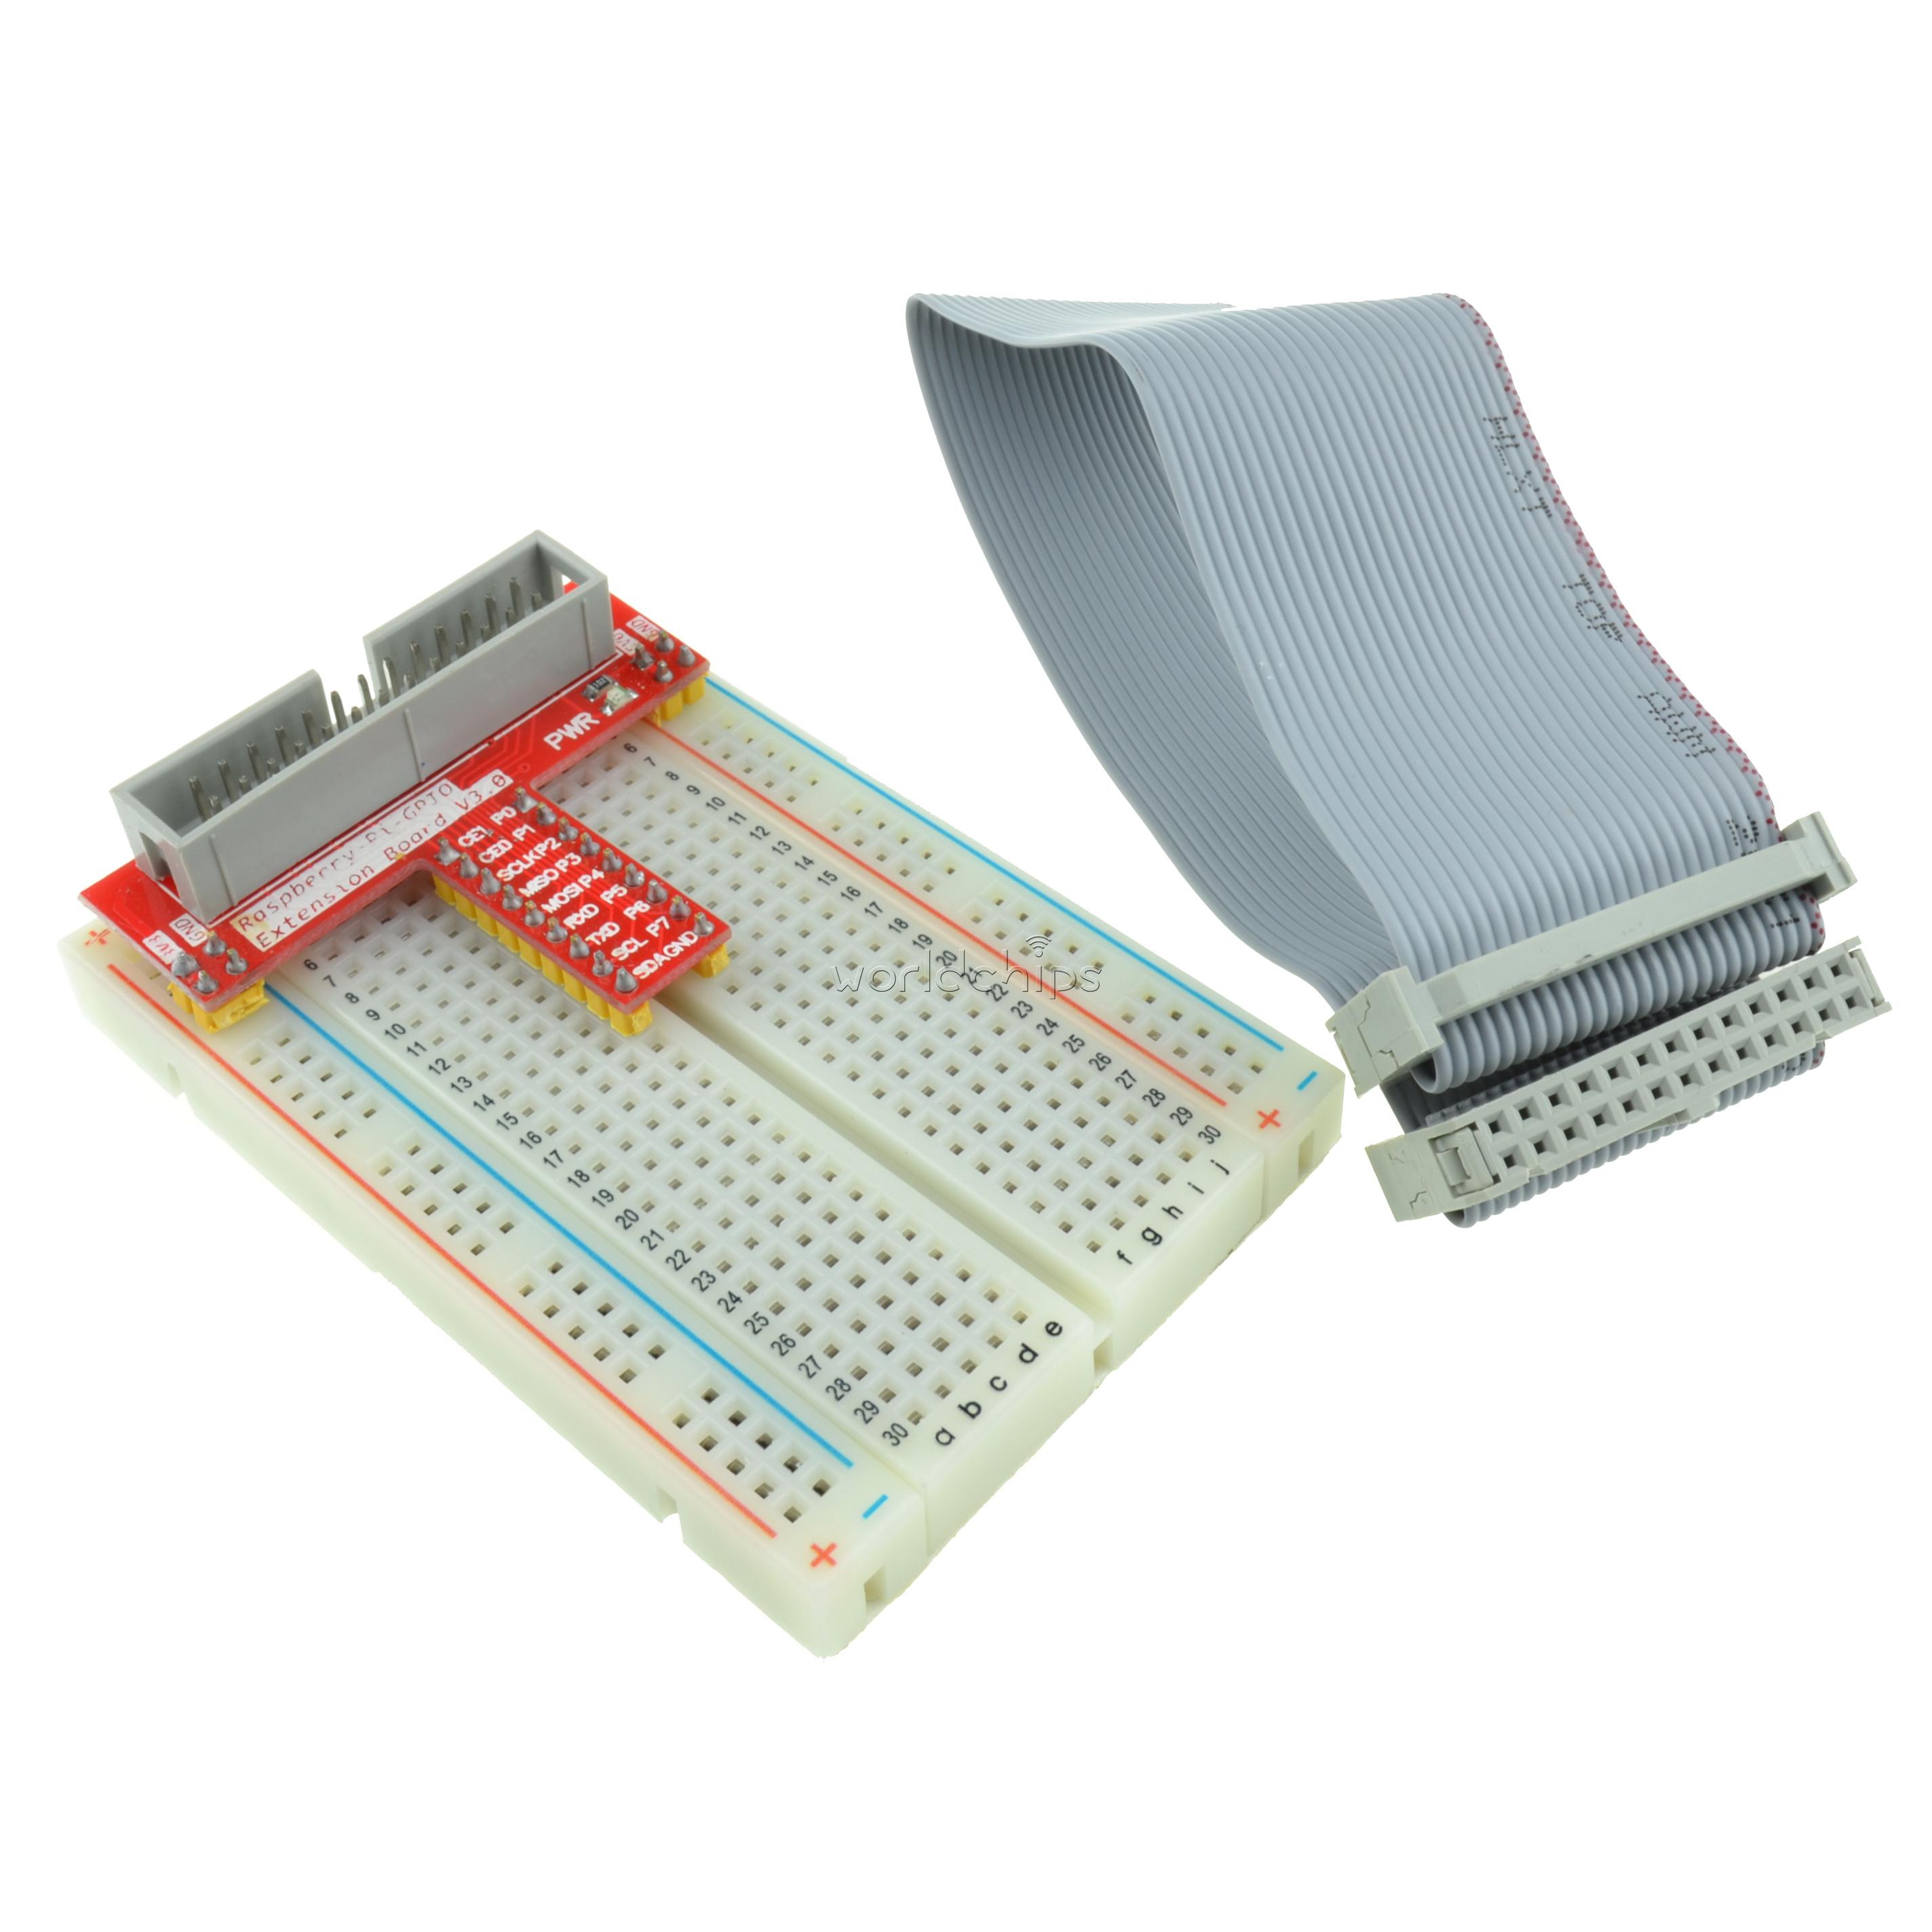 Raspberry Pi Gpio Kit Extension Board Adapter Breadboard